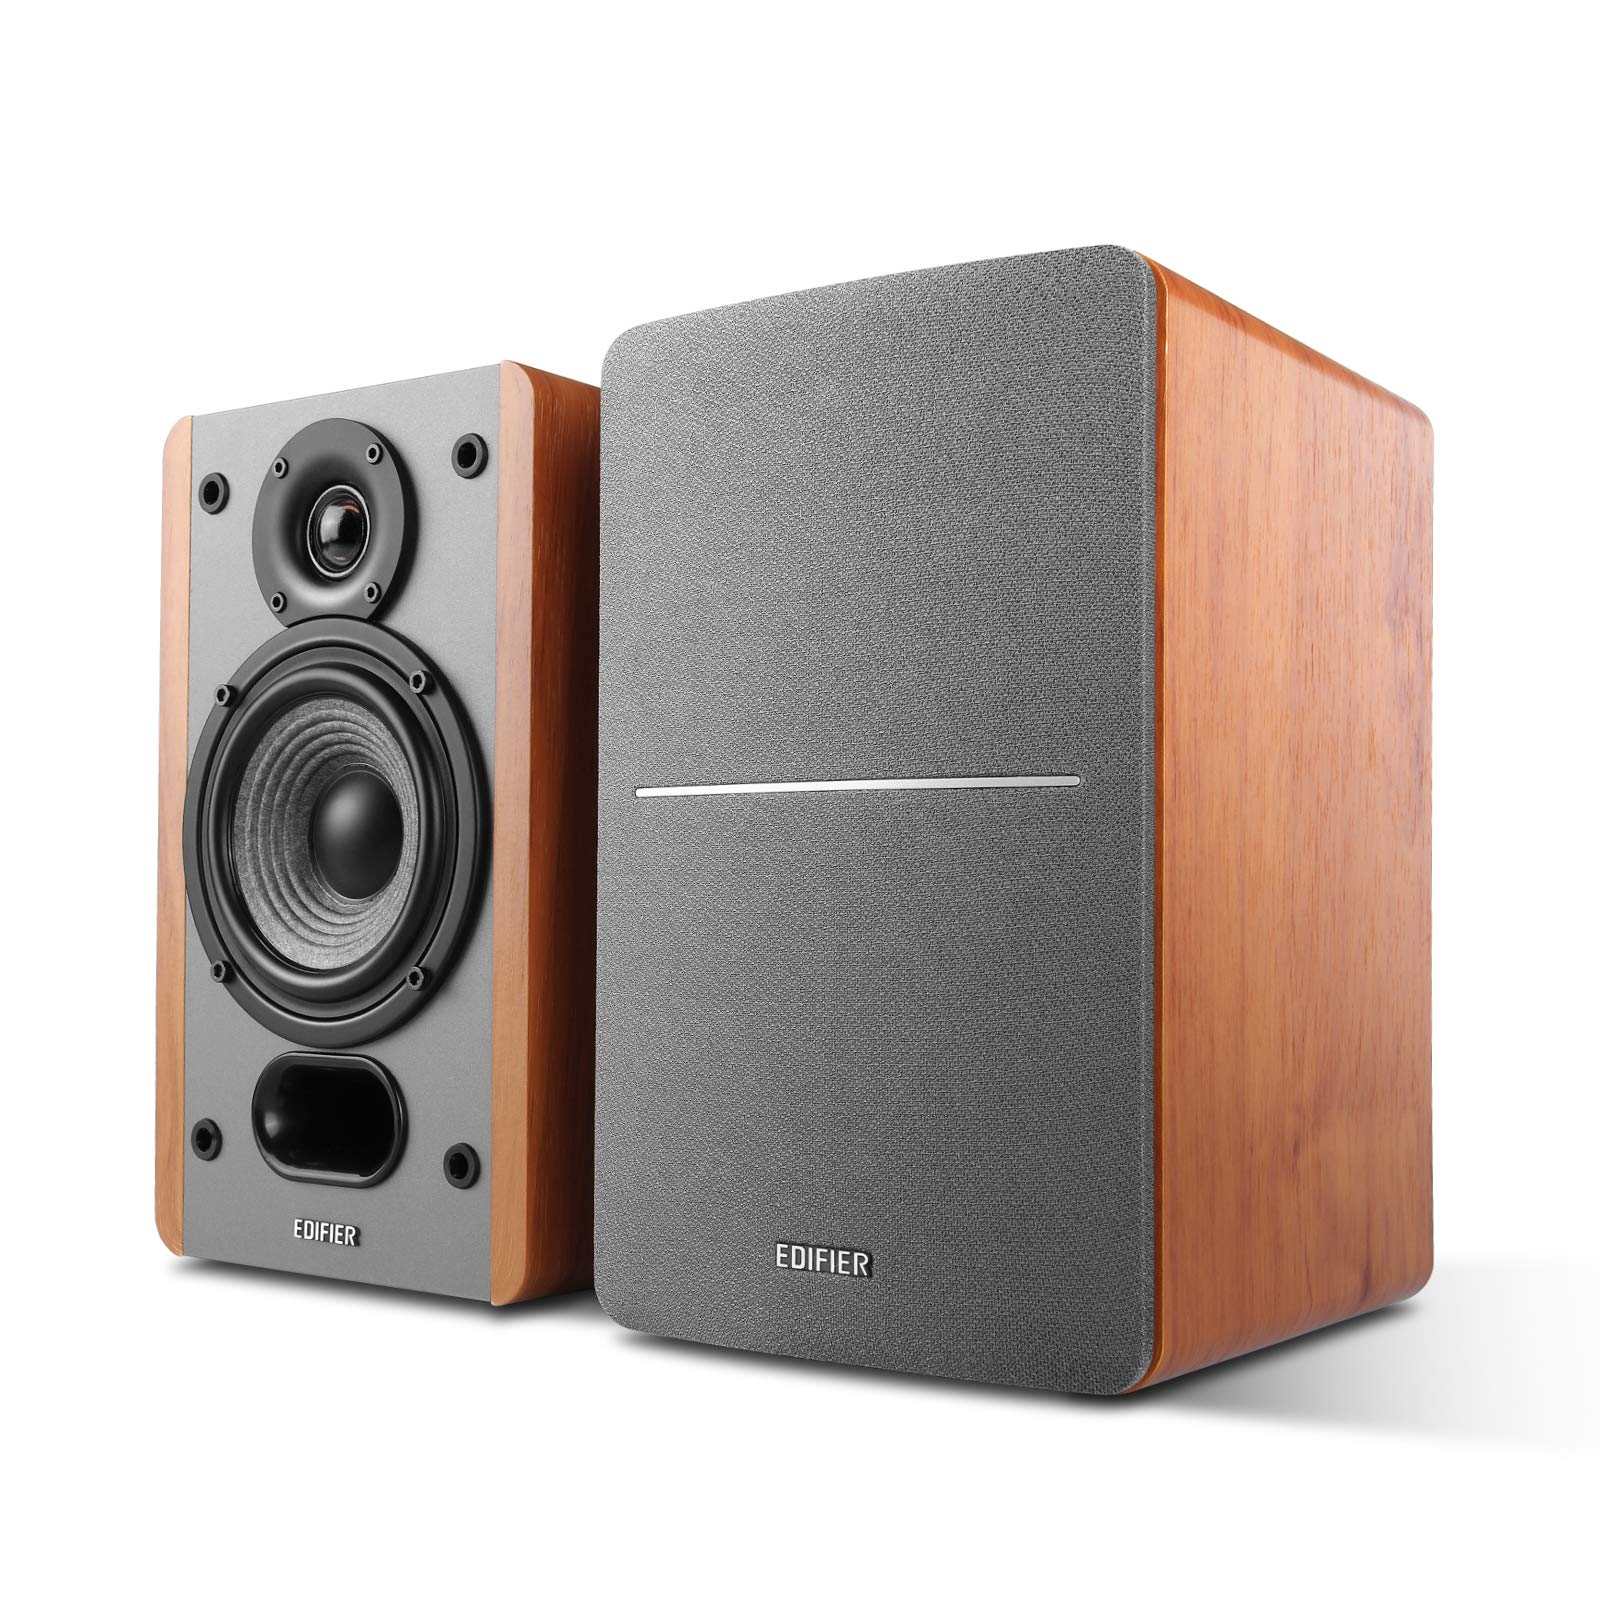 Edifier P12 Passive Bookshelf Speakers - 2-Way Speakers with Built-in Wall-Mount Bracket - Wood Color, Pair by Edifier